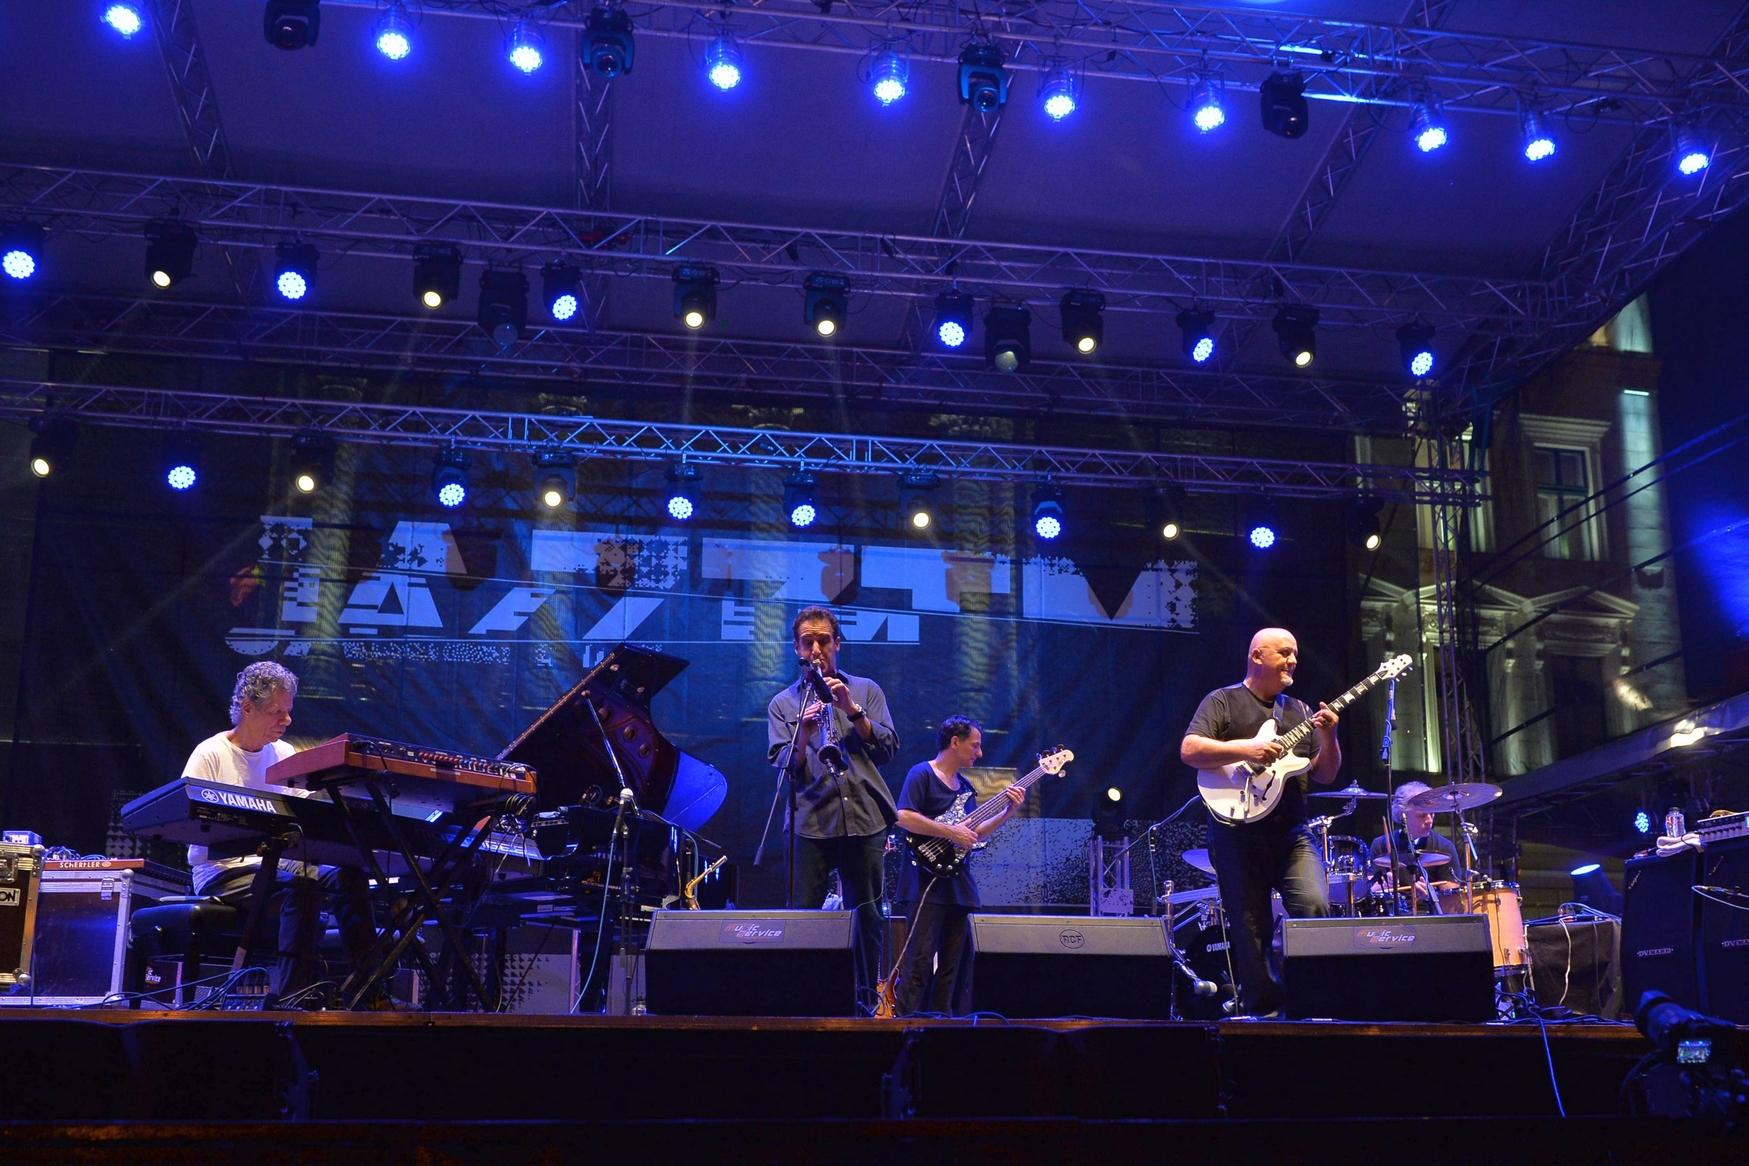 The Chick Corea Elektric Band feat. Frank Gambale, Eric Marienthal, John Patitucci și Dave Weckl at JazzTM Festival